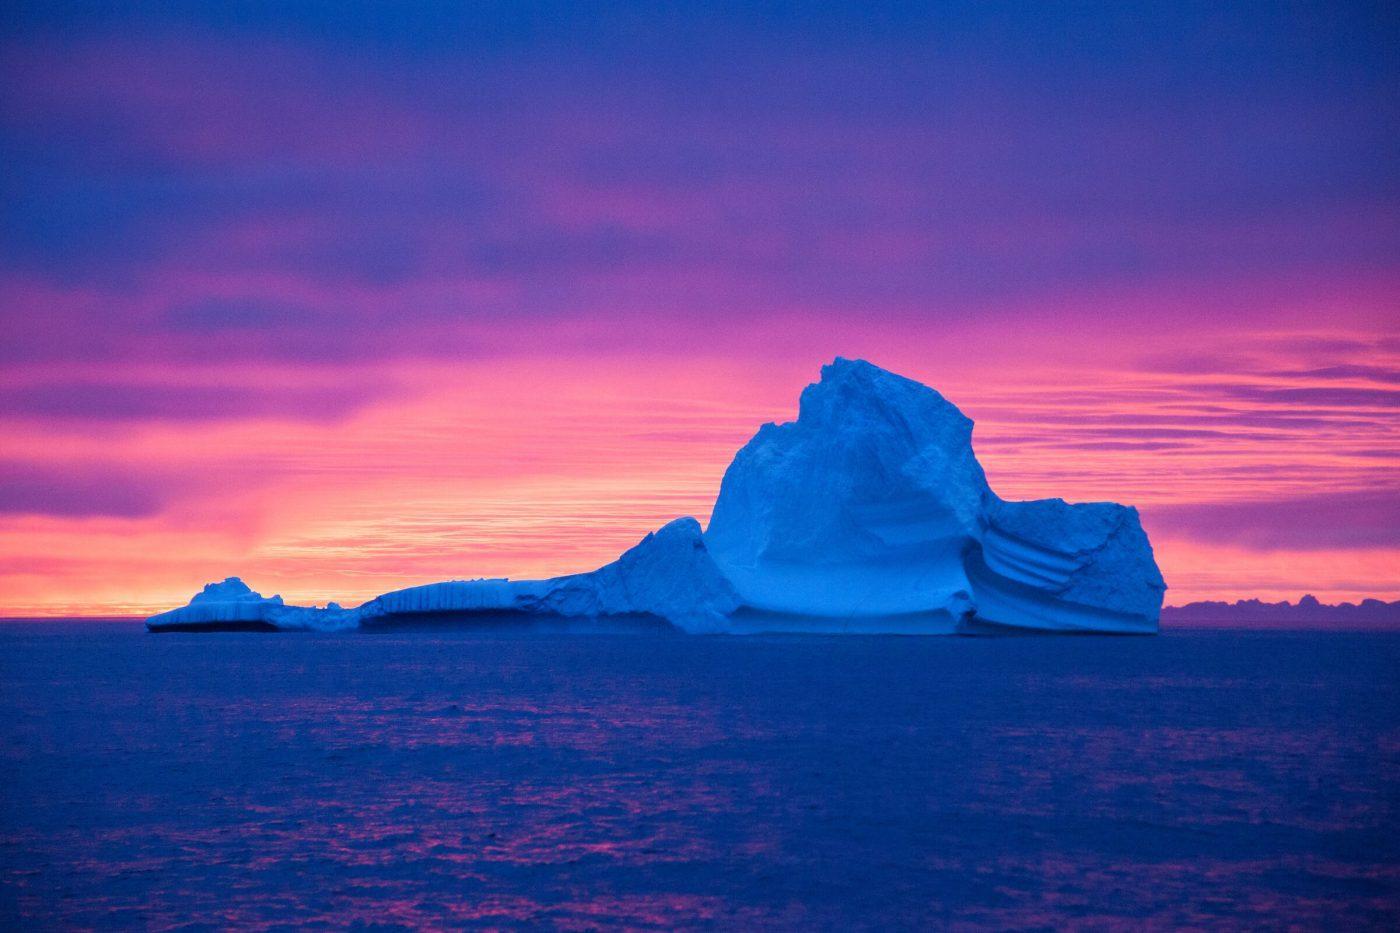 Sunset behind icebergs. By Glenn Mattsing